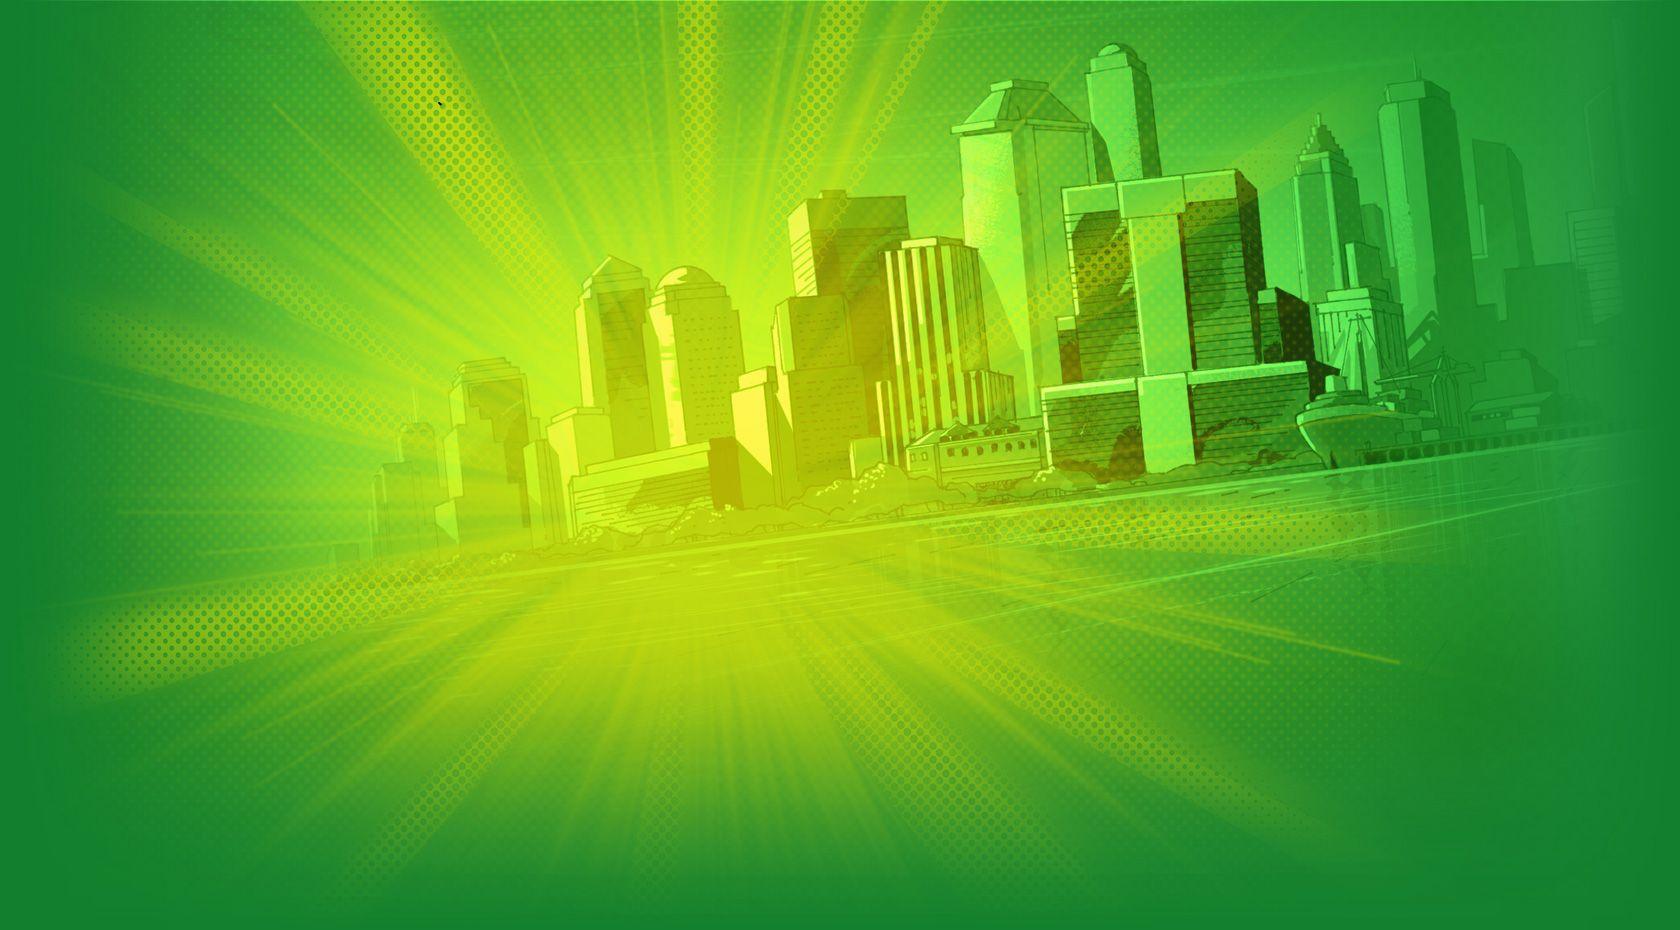 Wiki Code Superhero City | StrucidCodes.com